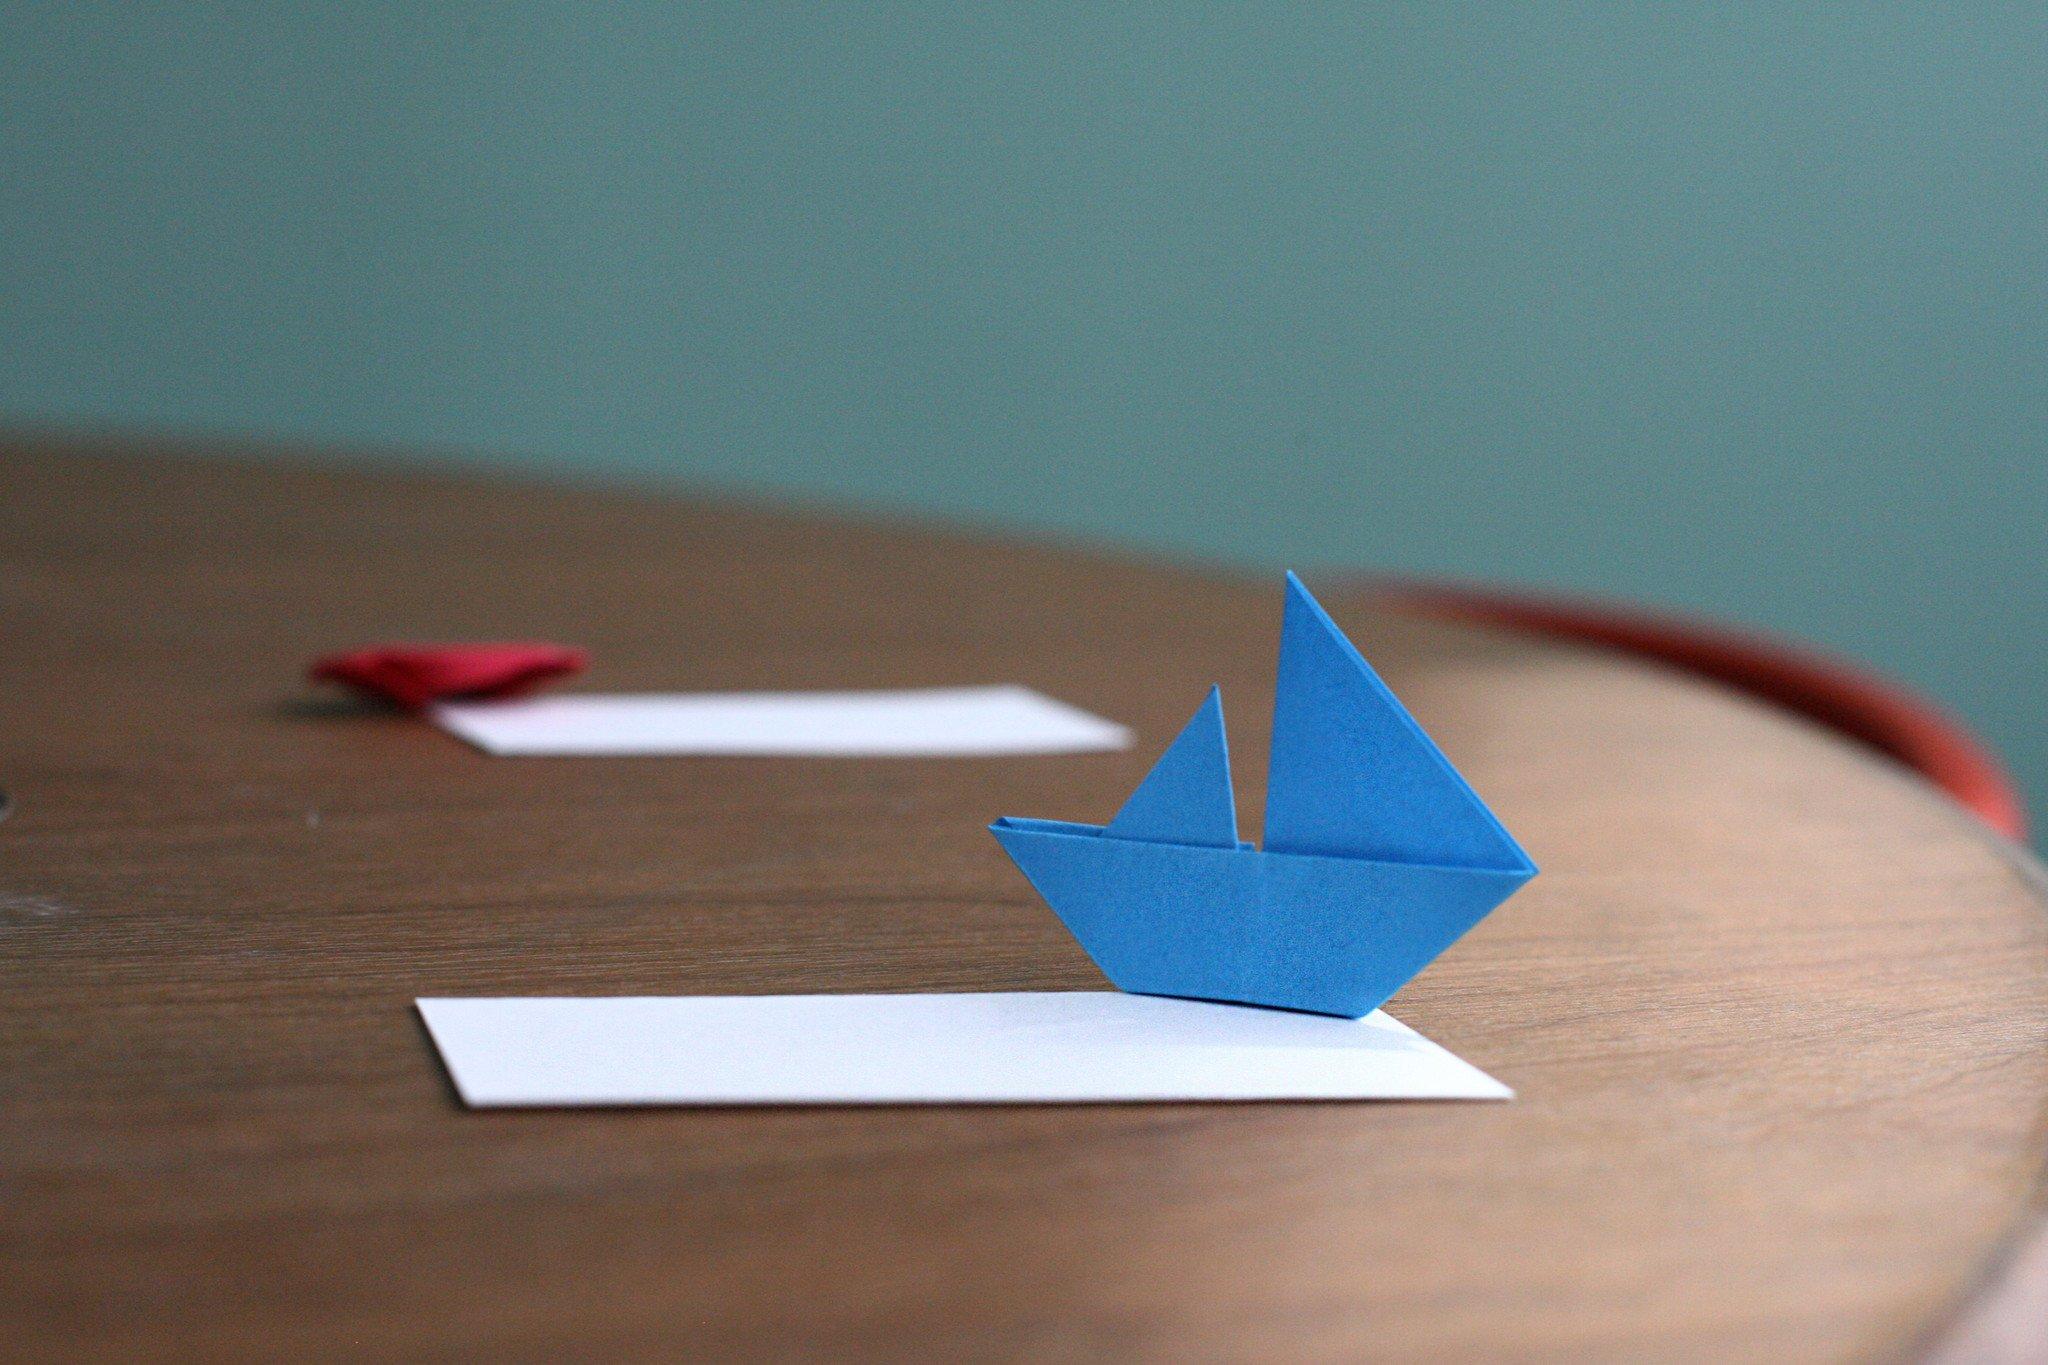 Fond D Ecran 2048x1365 Px Profondeur De Champ Macro Minimalisme Origami Papier Bateau A Voile Navire Table 2048x1365 Wallbase 1434885 Fond D Ecran Wallhere